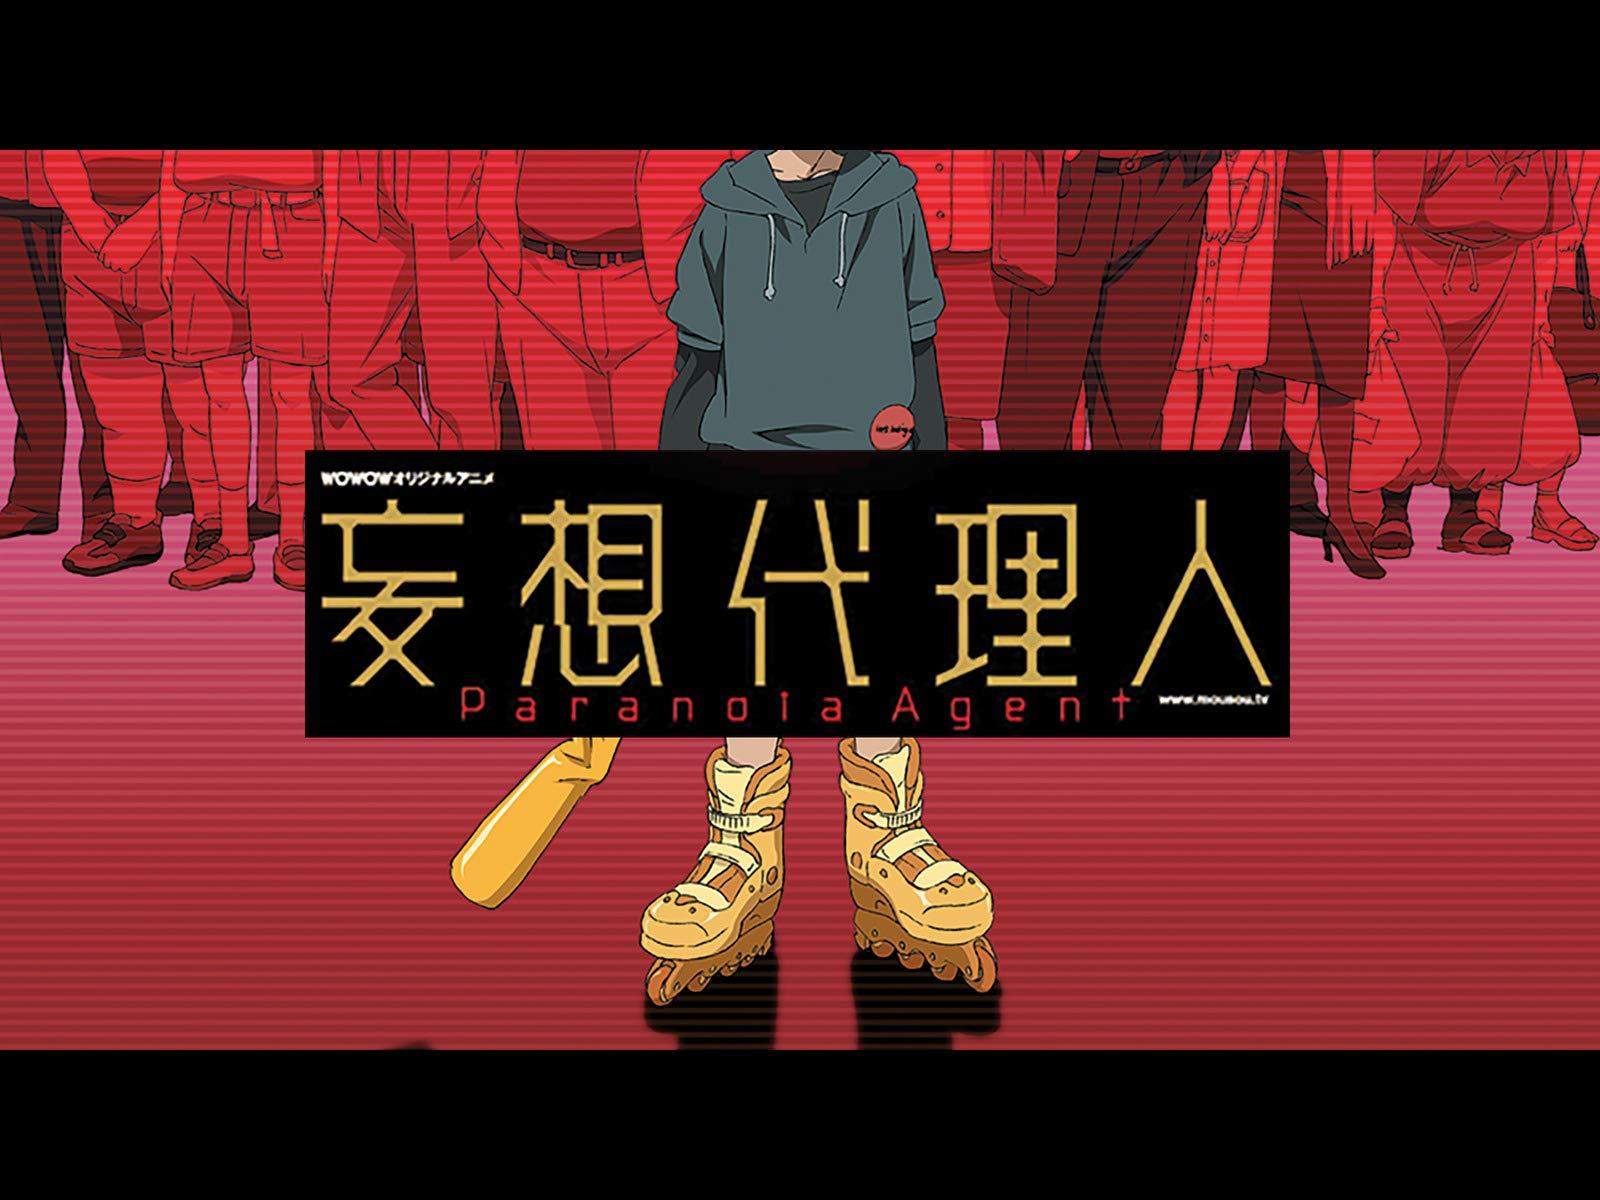 Amazon.co.jp: 妄想代理人を観る | Prime Video